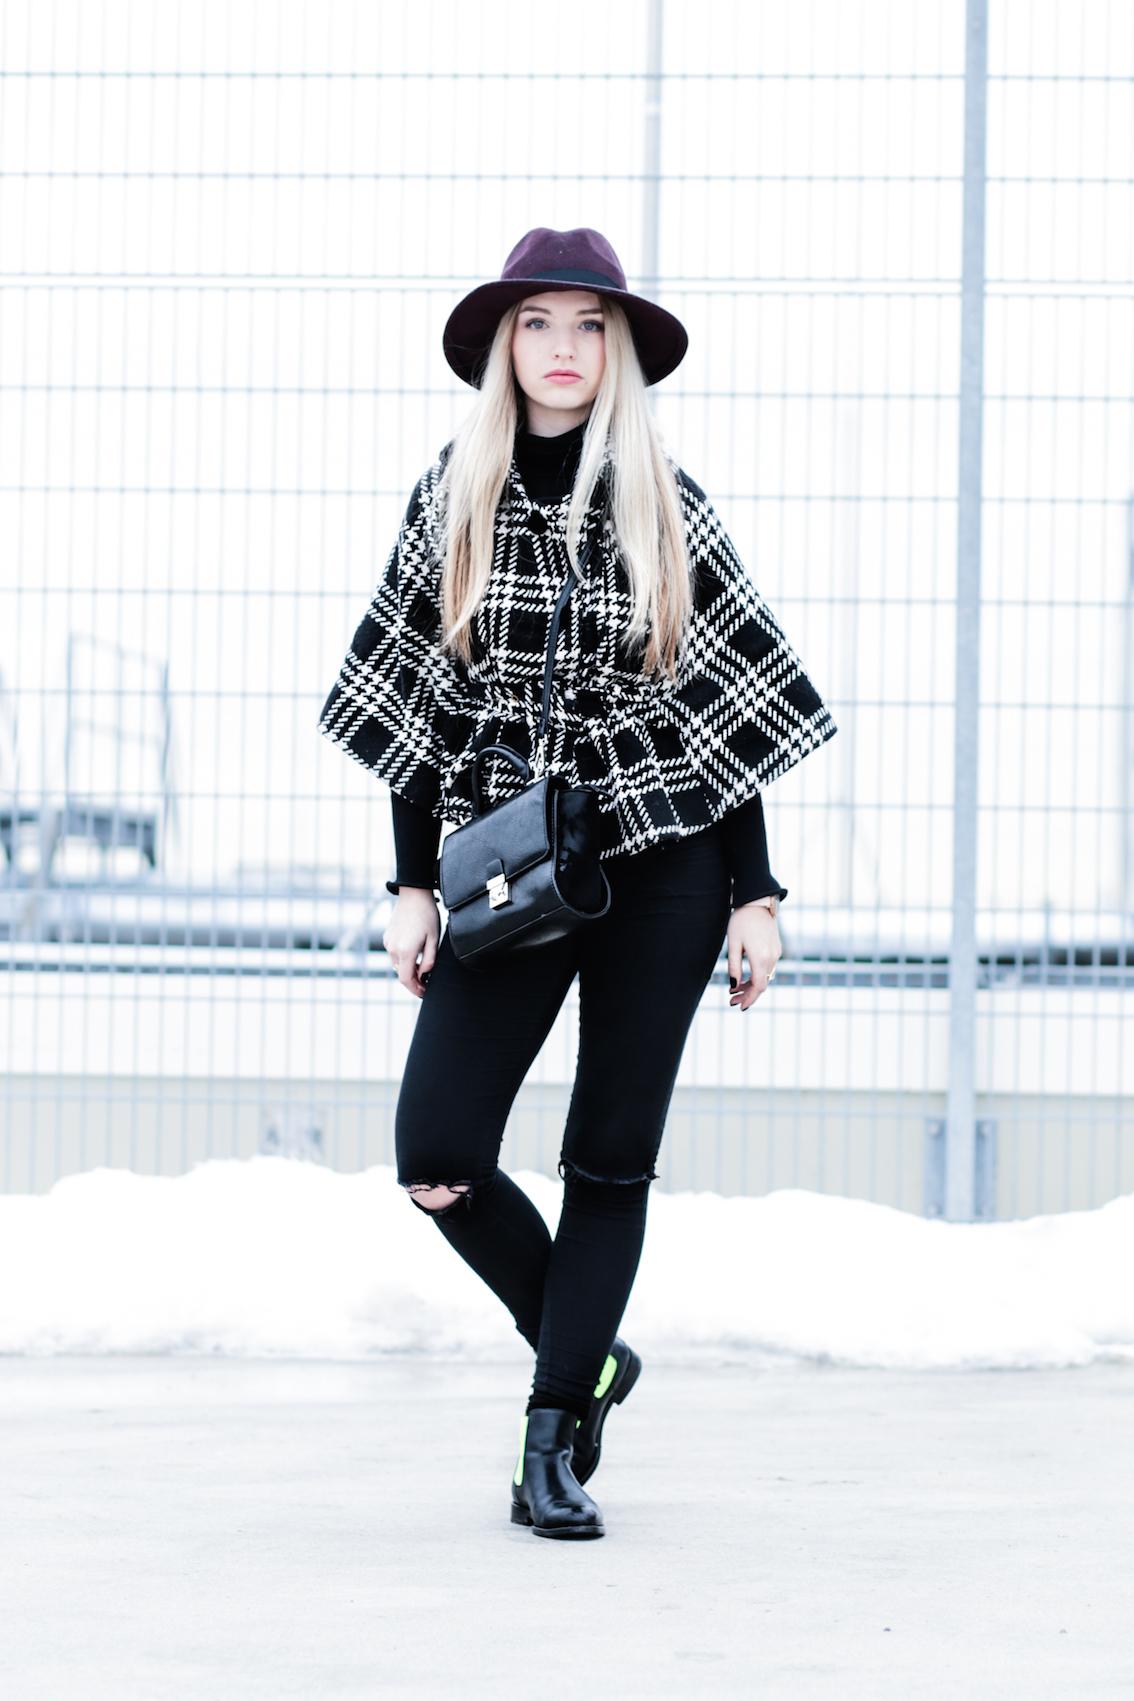 Hut Primark Serfan Chelsea Boots, Cape Poncho Fashionblog Modeblog Fashionblogger Modeblogger München Berlin Lifestyleblog